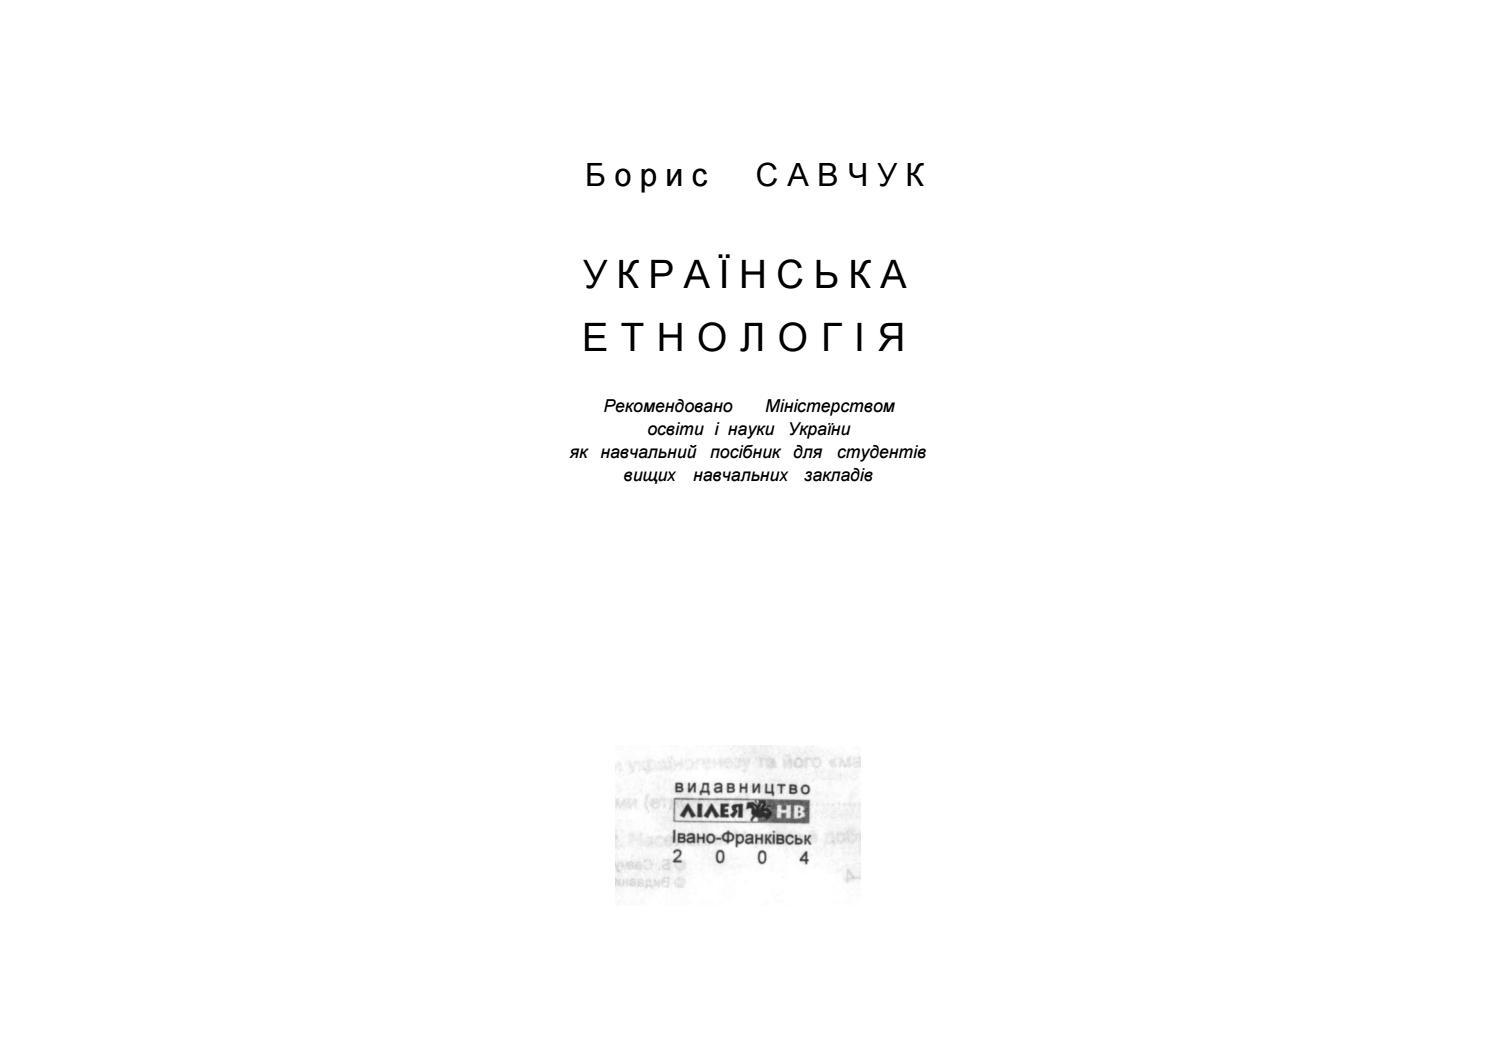 Ukrainian ethnology. B. Savchuk by coinsgenius - issuu a9ad47950ffd7